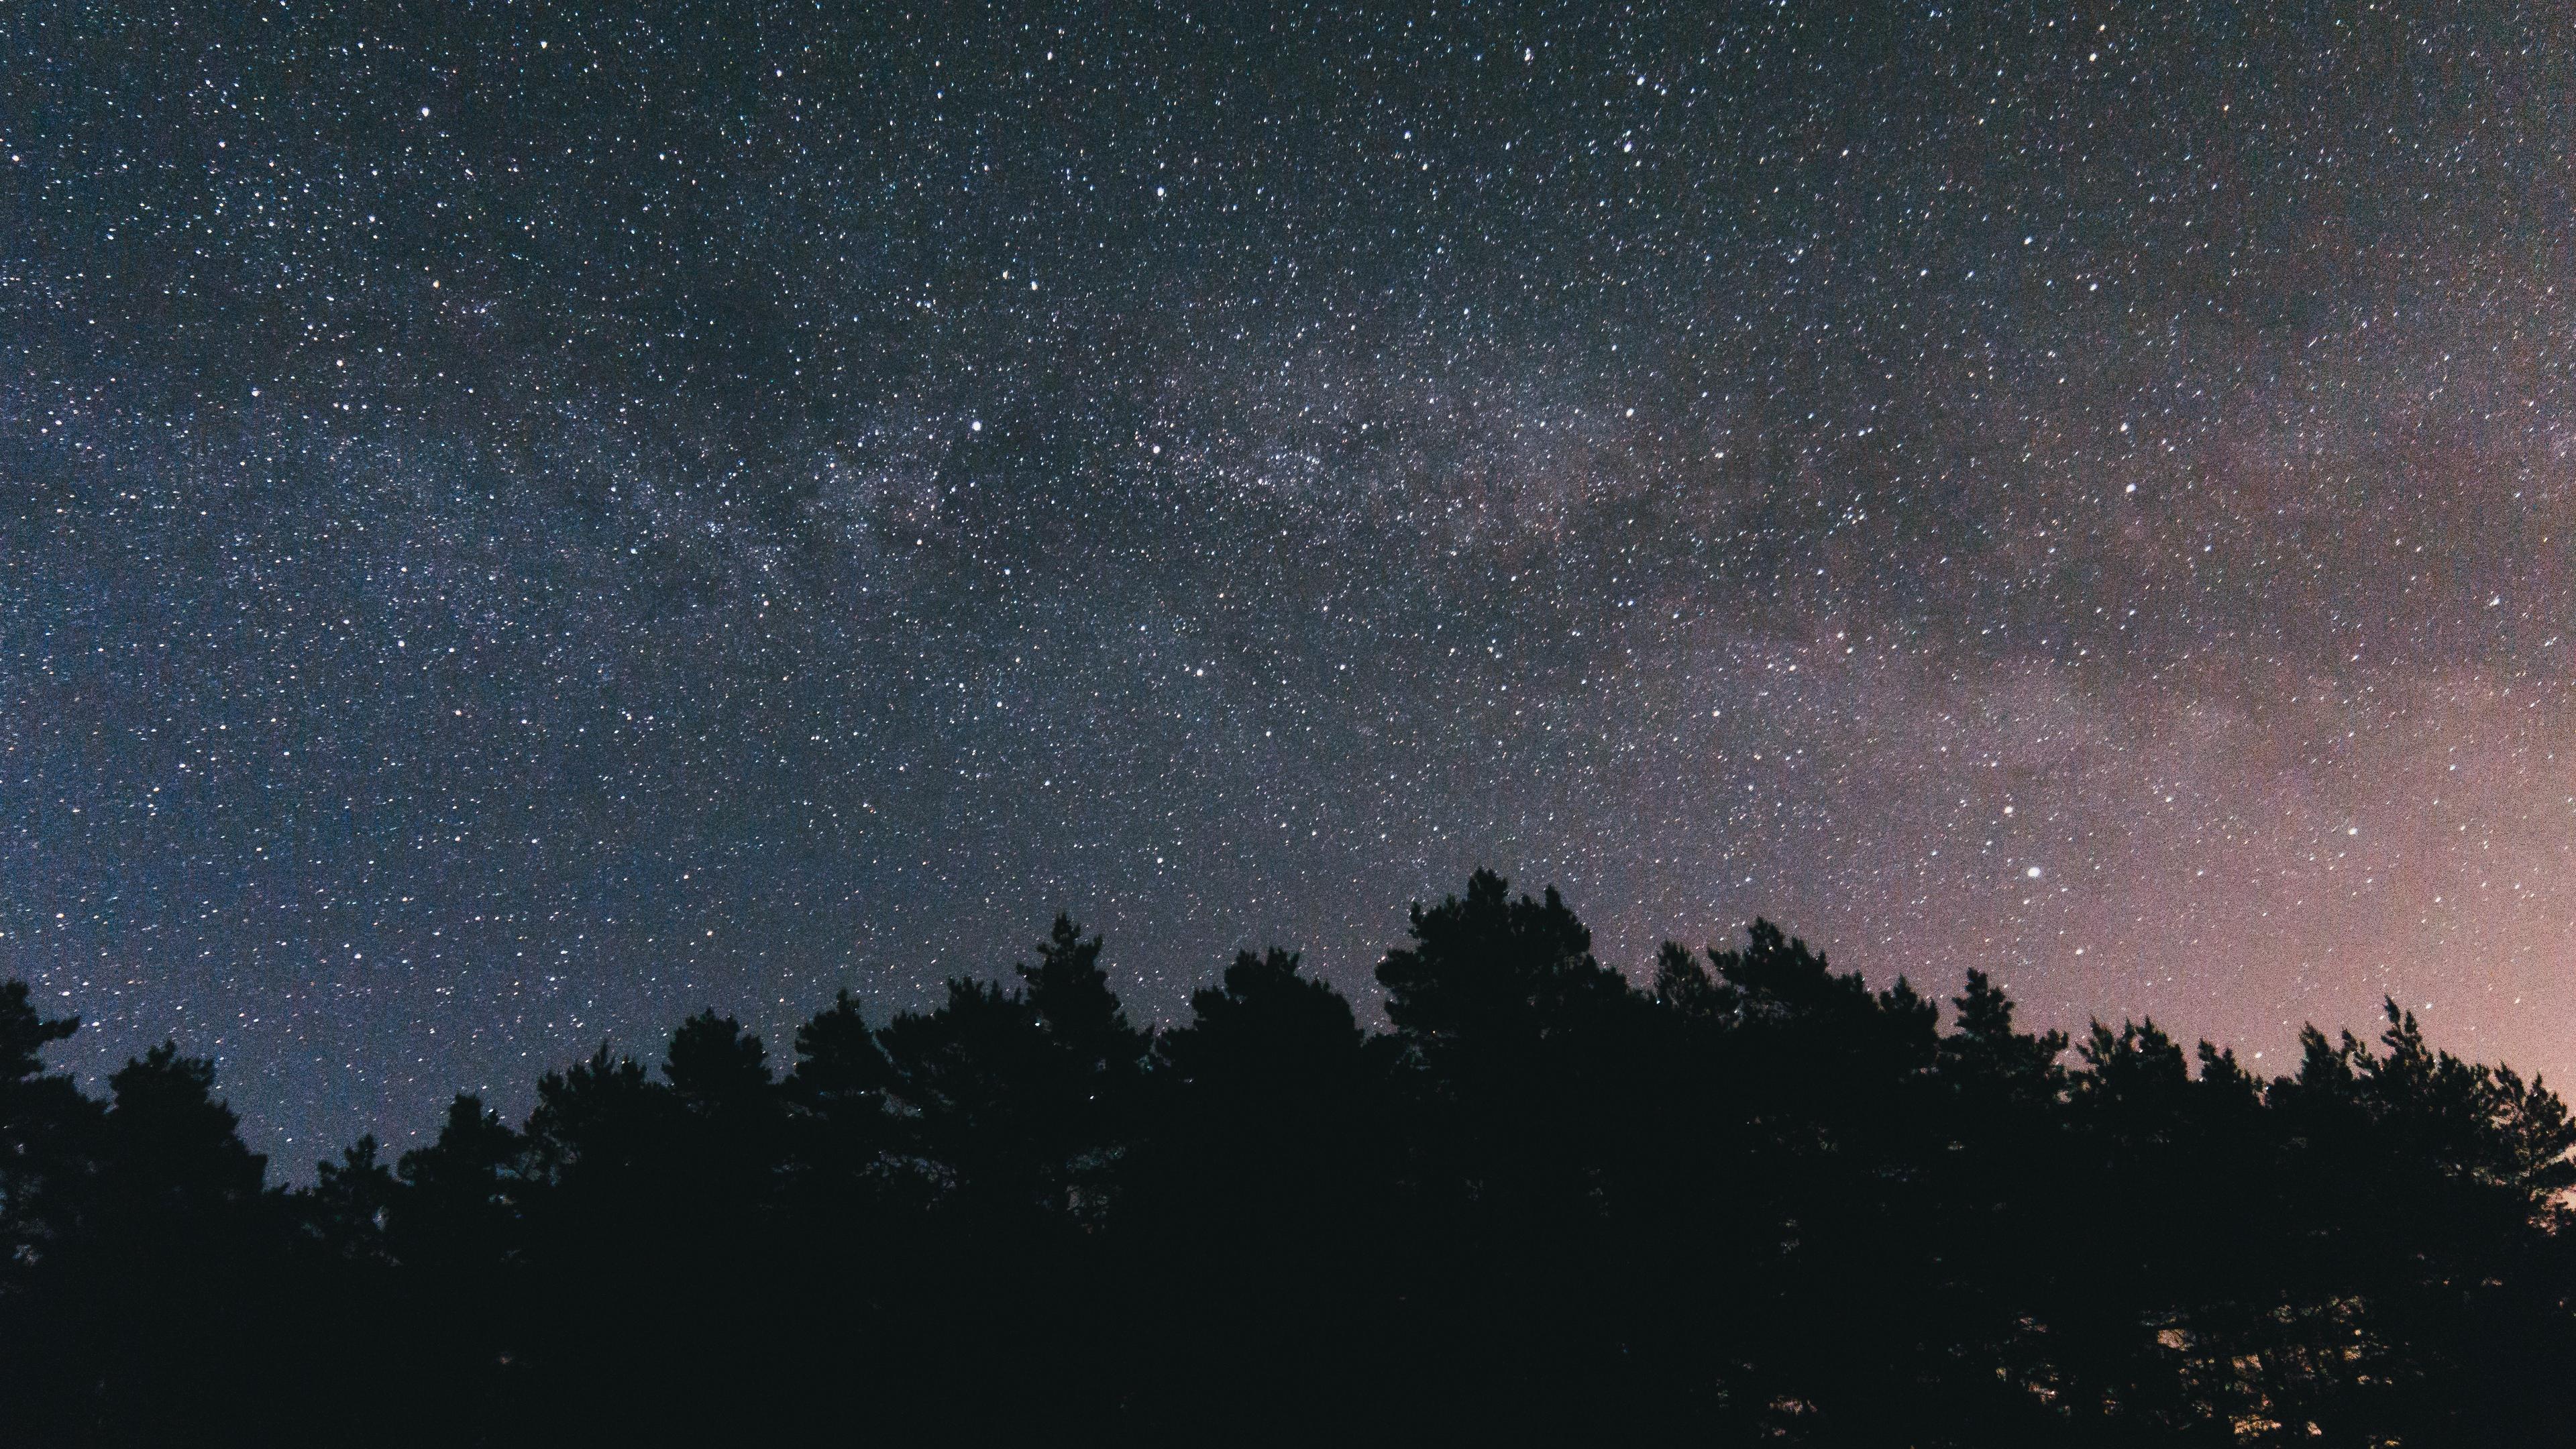 Wallpaper 4k Starry Sky Night Trees Sky 4k Night Starry